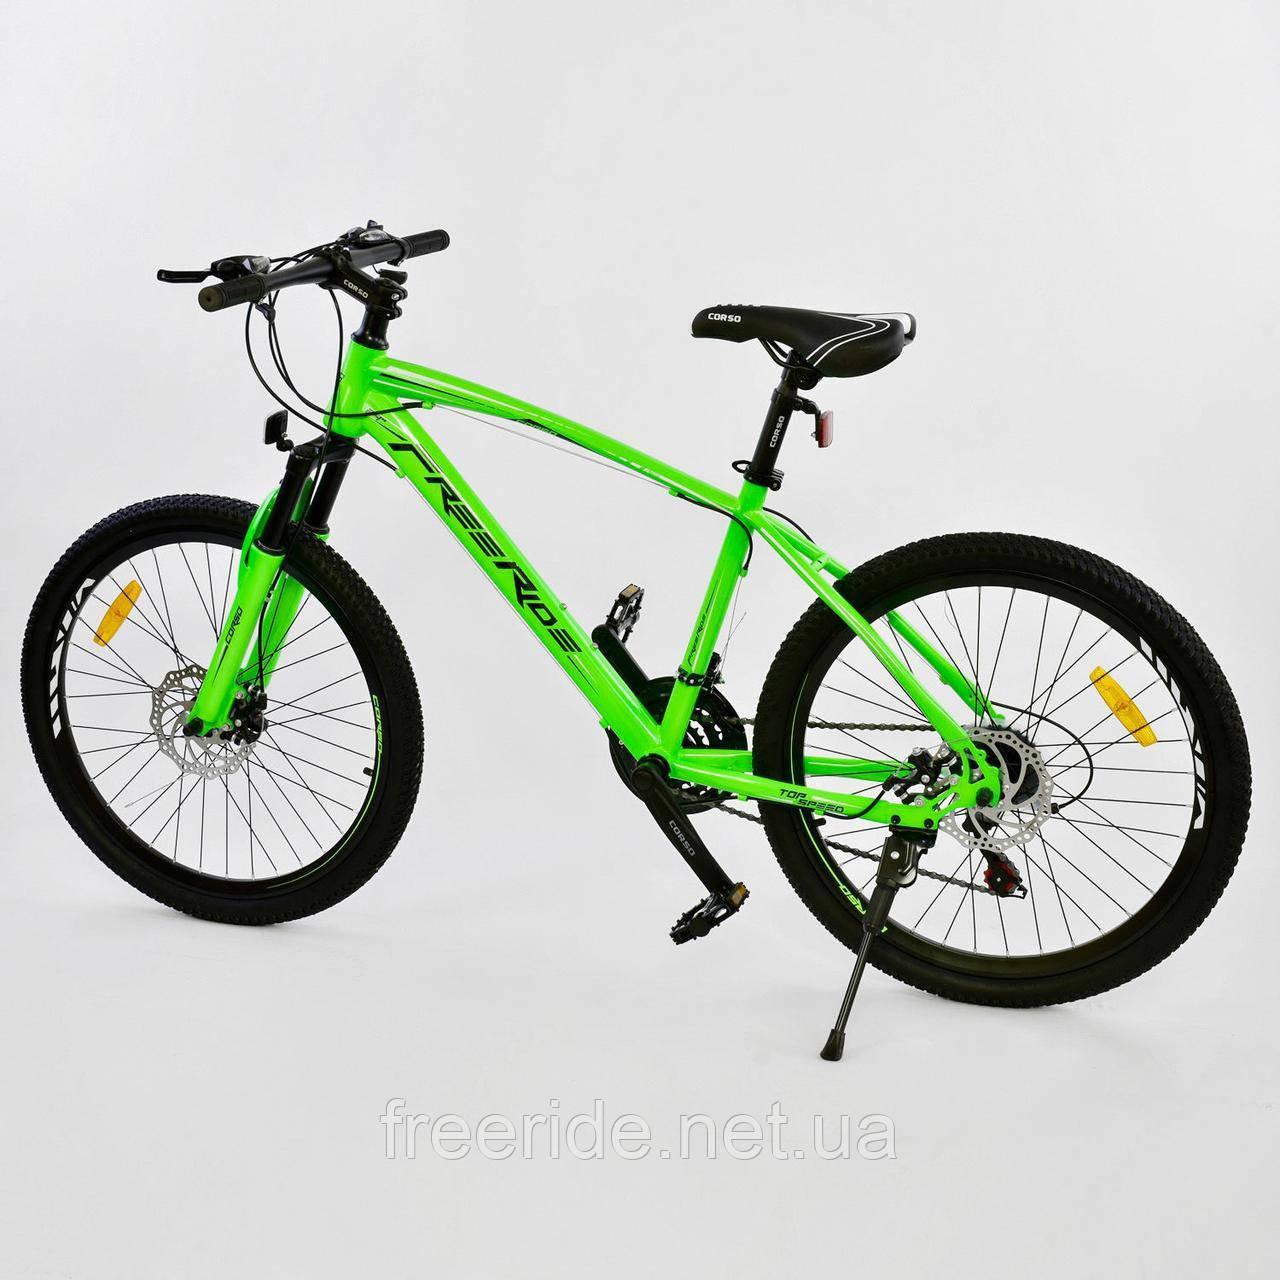 Подростковый Велосипед Corso Free Ride 24 (13 рама)